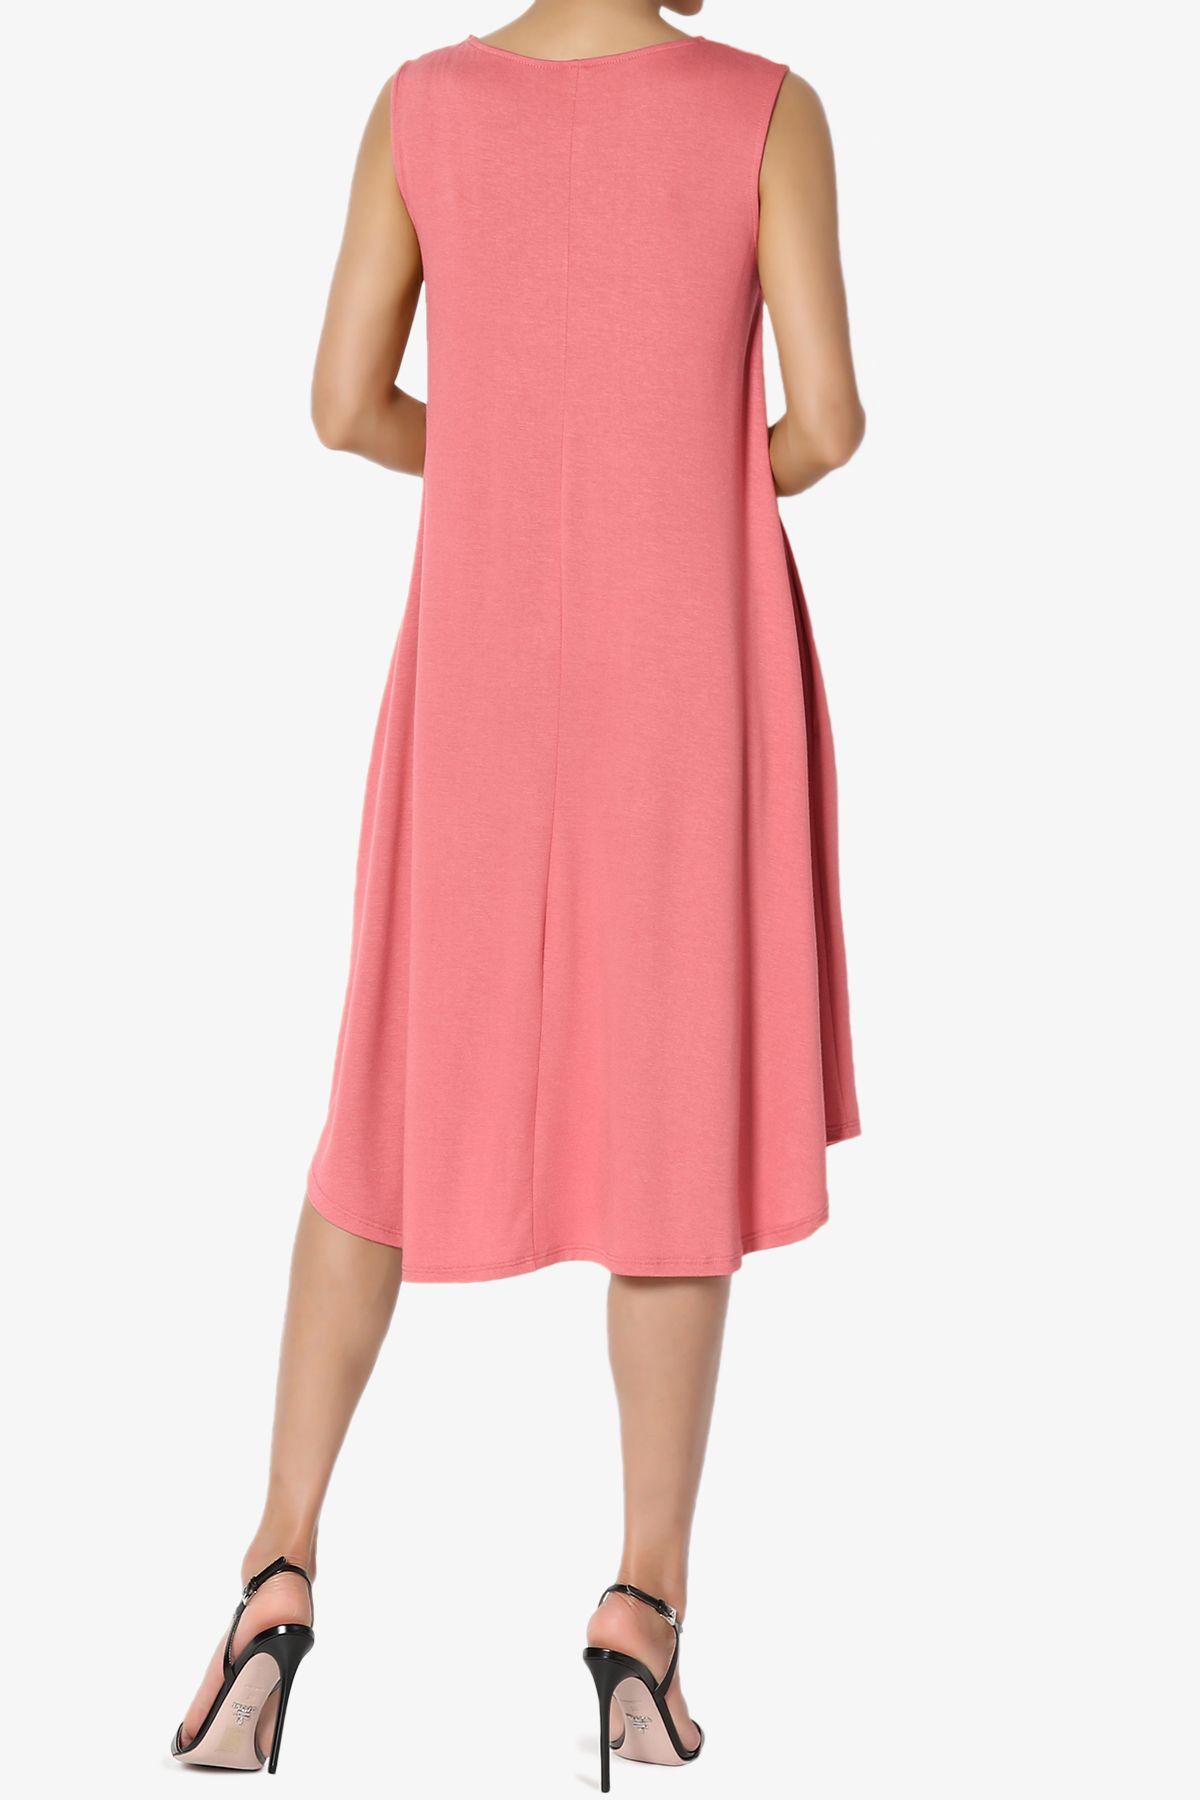 Themogan Themogan Women S S 3x Sleeveless Fit Flare A Line Draped Jersey Midi Long Dress Walmart Com Long Midi Dress Fashion Dresses [ 1800 x 1200 Pixel ]